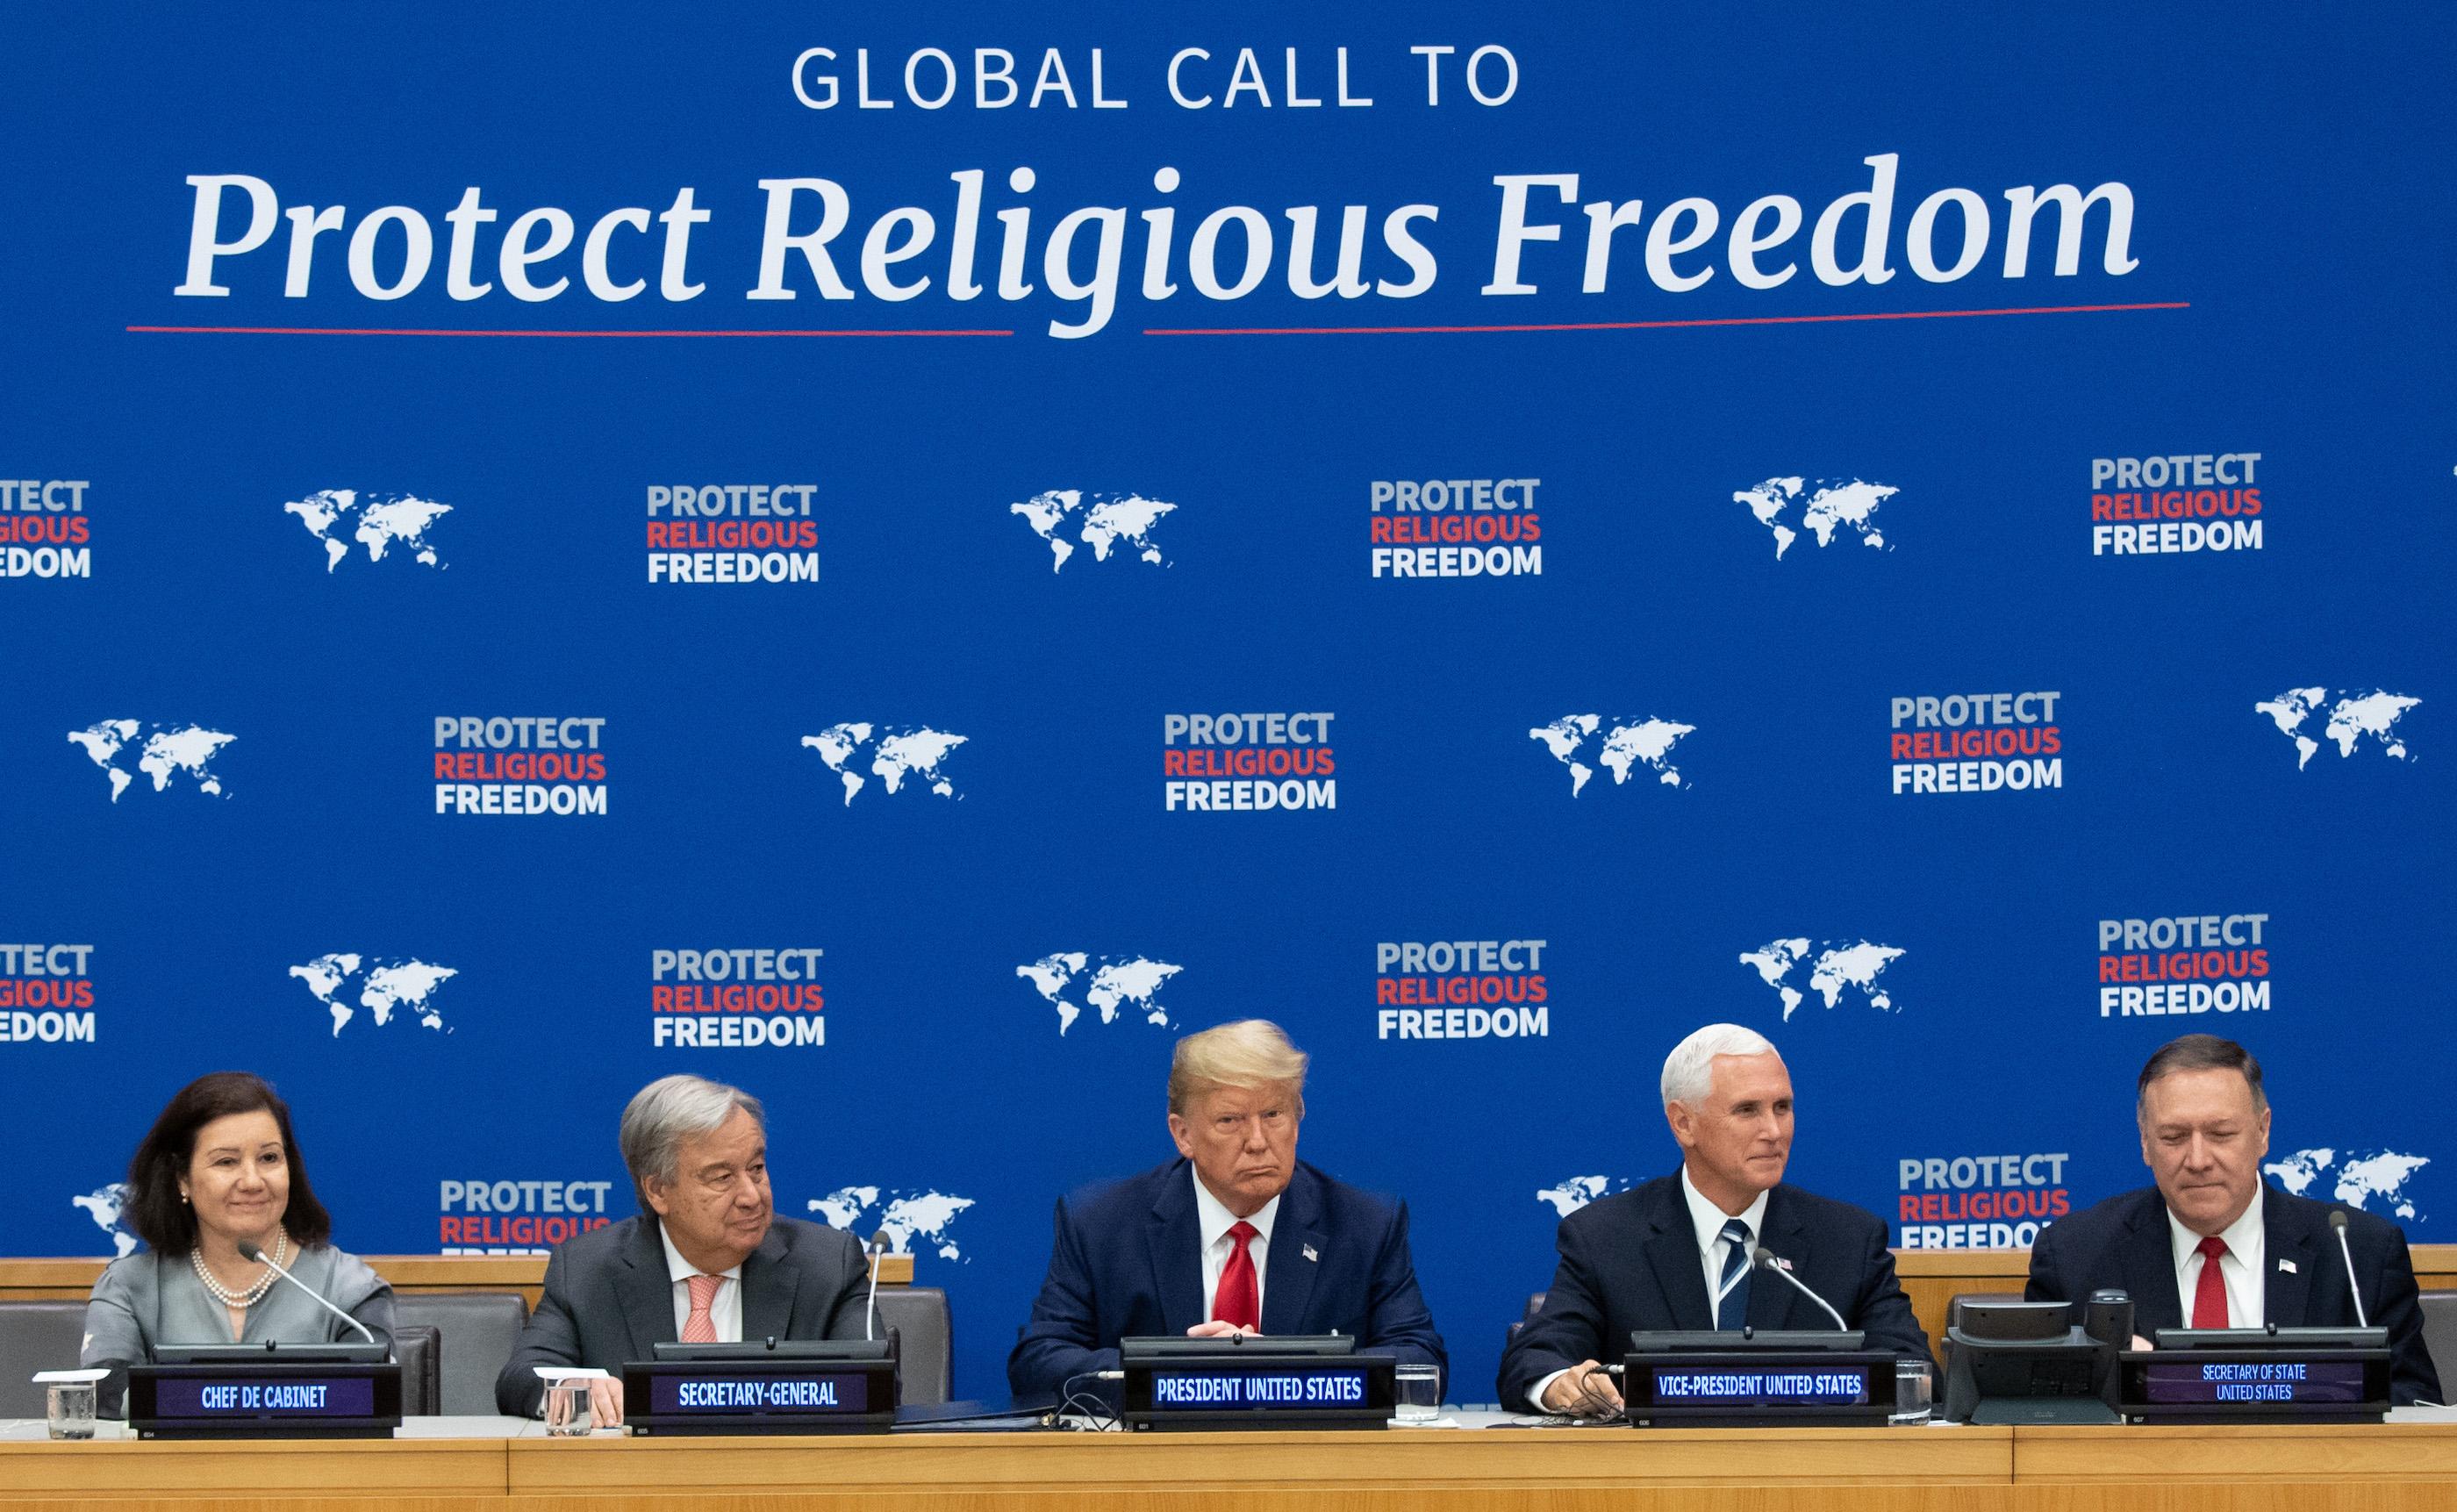 UN-US-RELIGIOUS FREEDOM-TRUMP